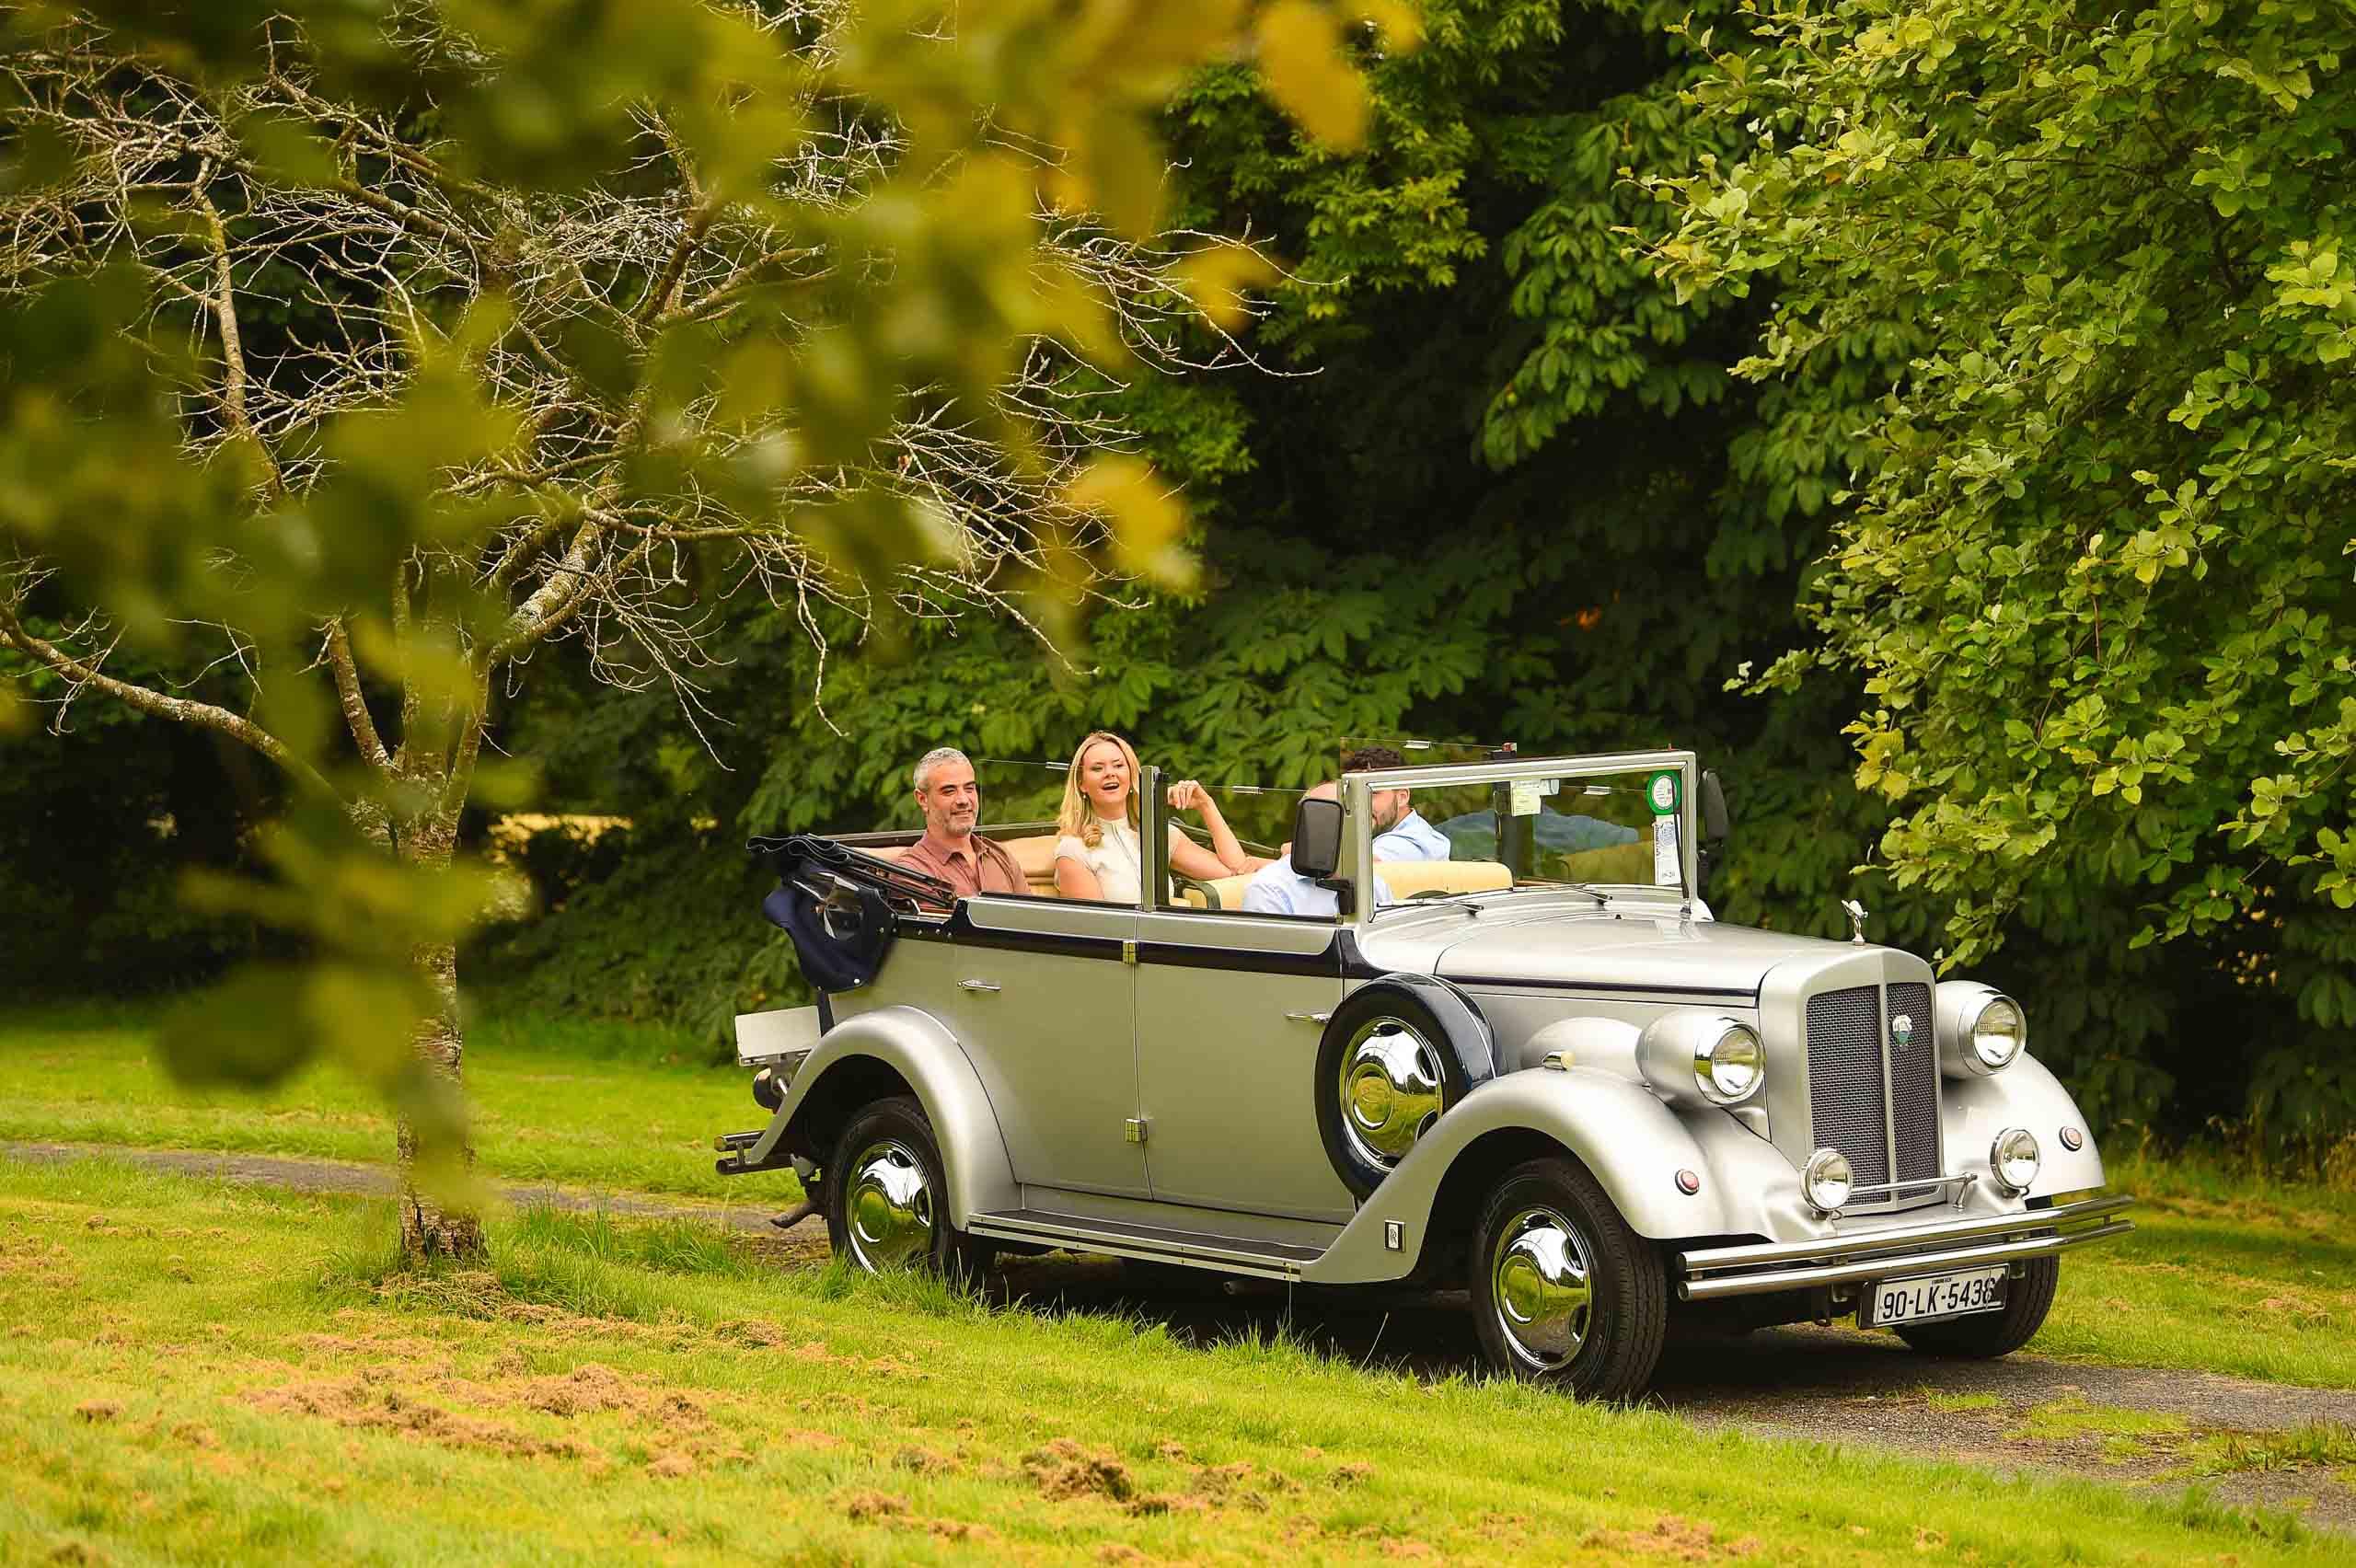 chauffeur driven vintage cars